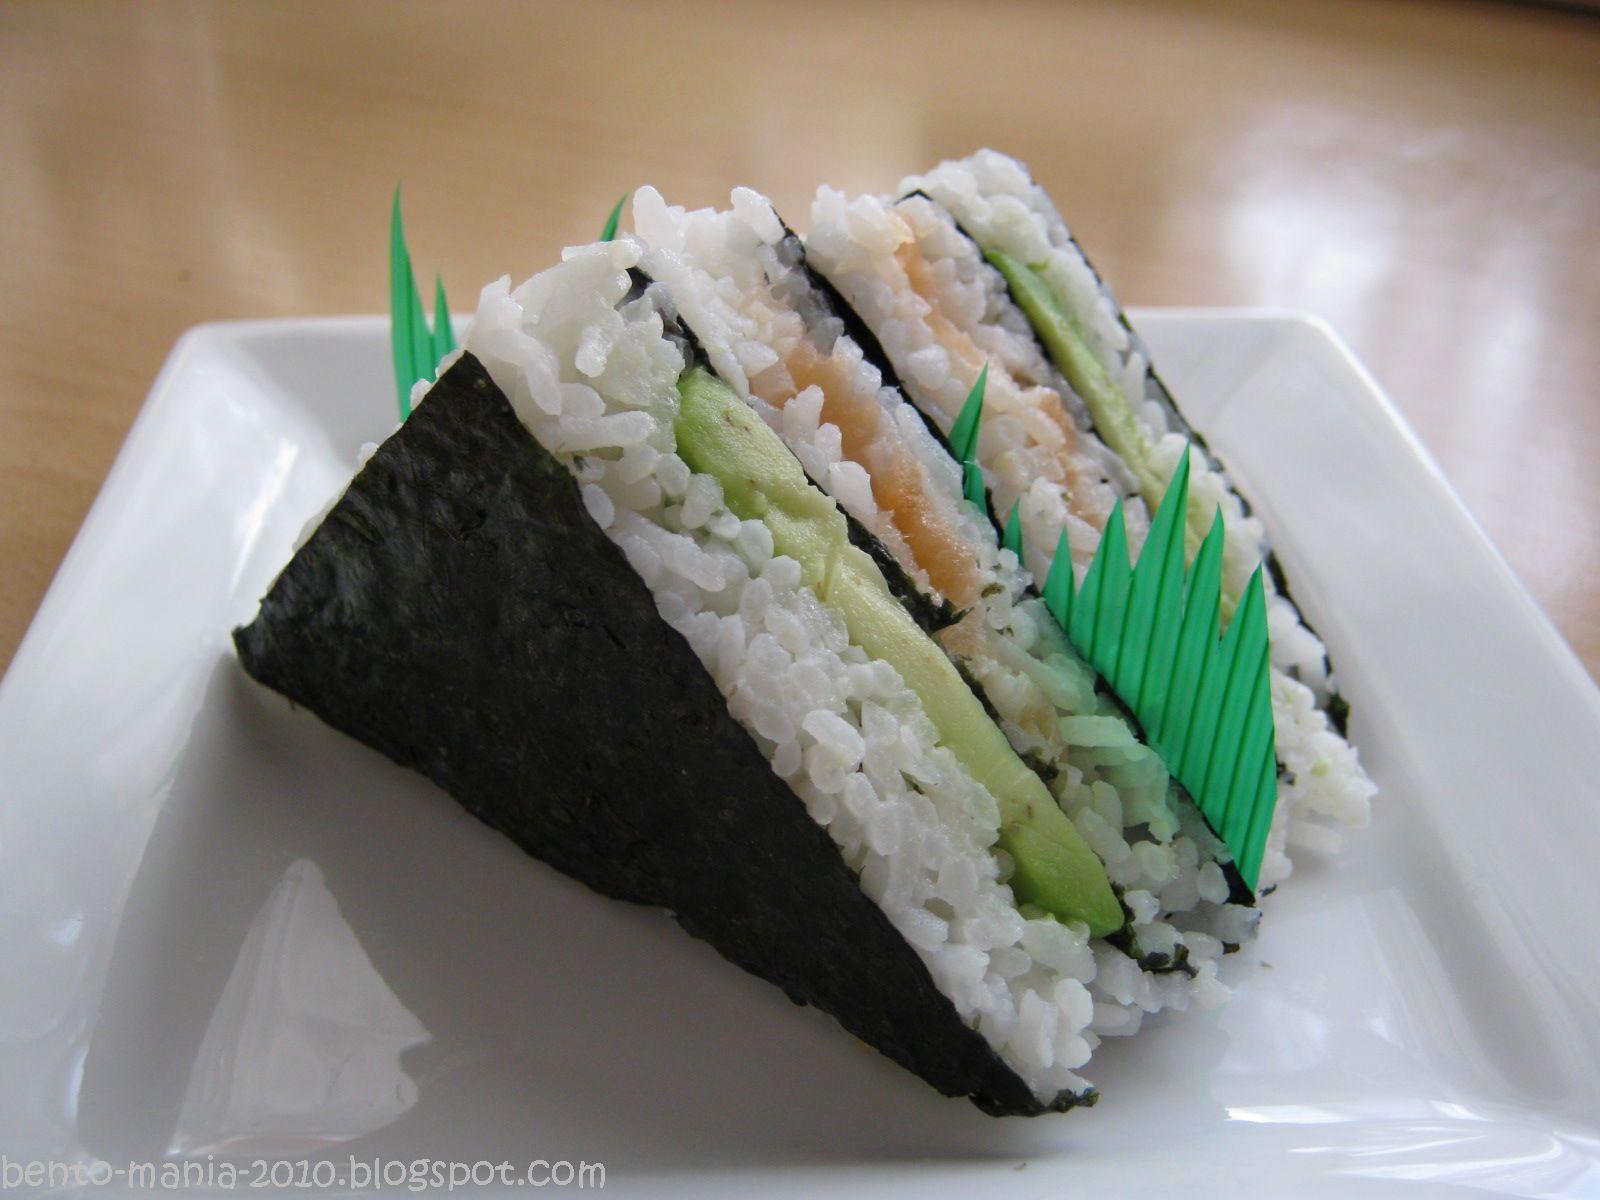 bento mania verr ckt nach der japanischen lunch box rezept des monats sushi sandwich. Black Bedroom Furniture Sets. Home Design Ideas